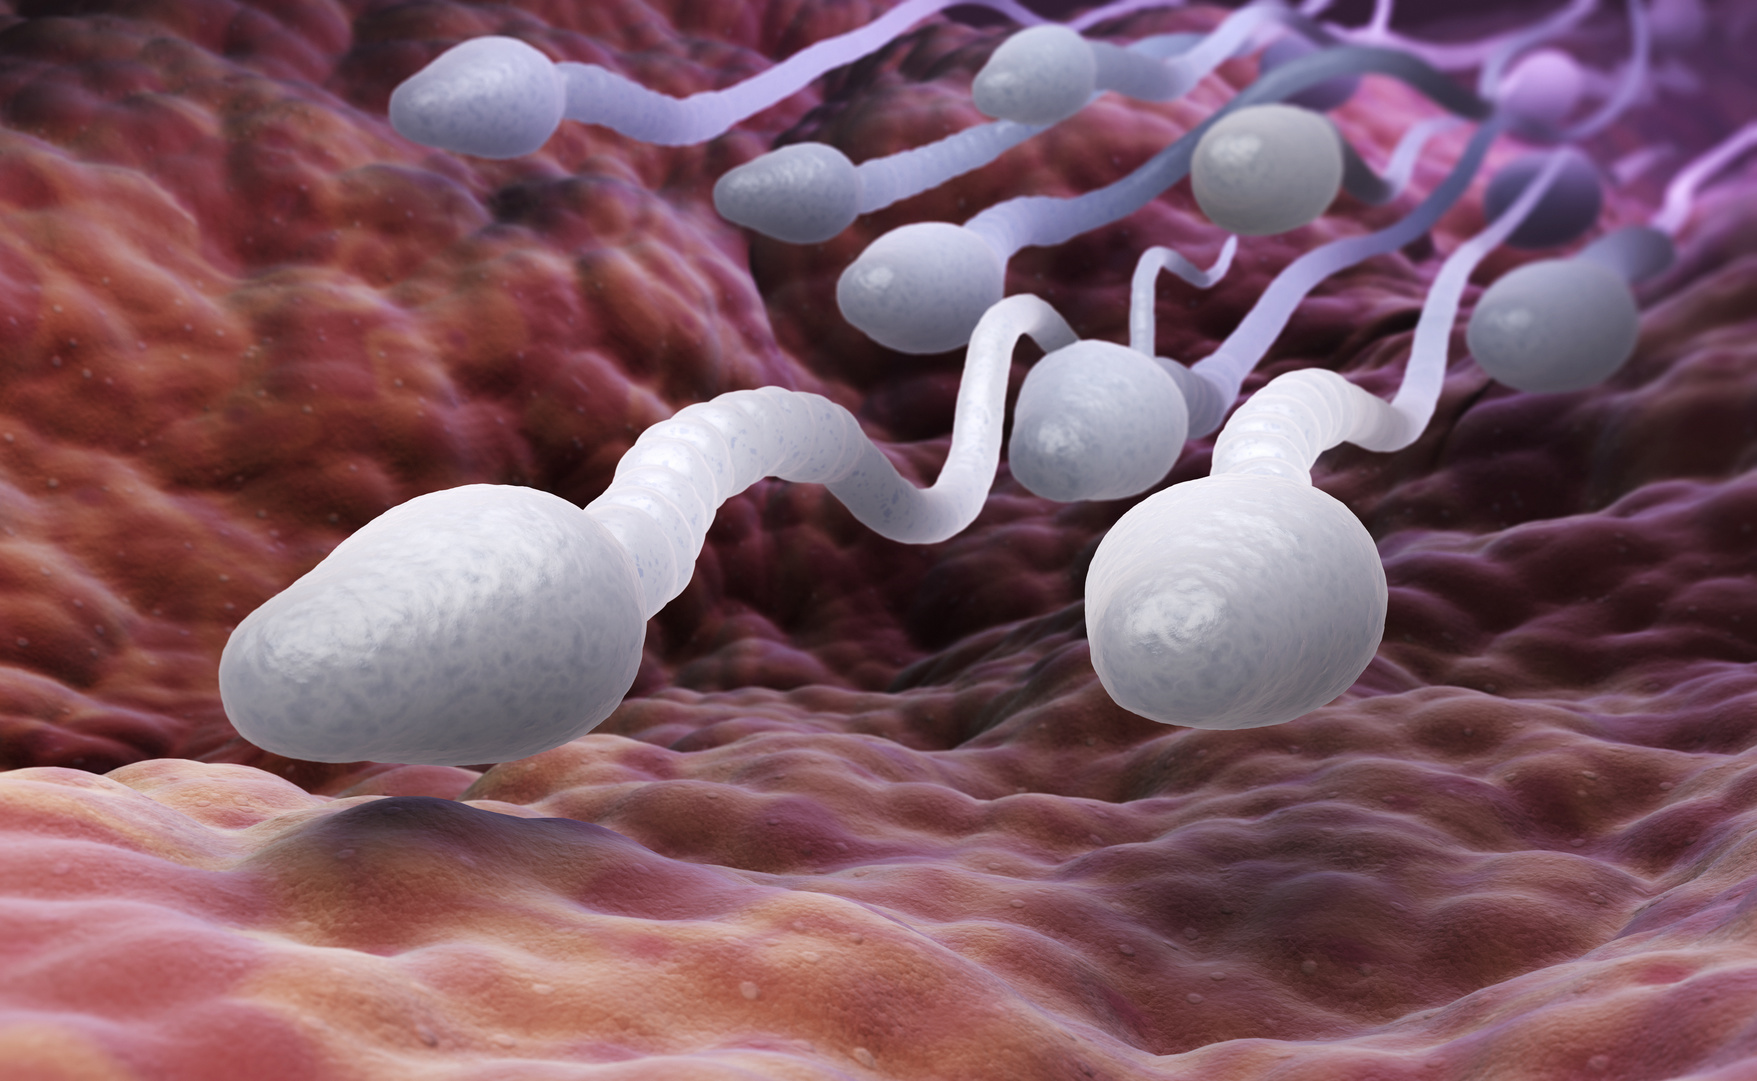 espermatozoides dentro do utero